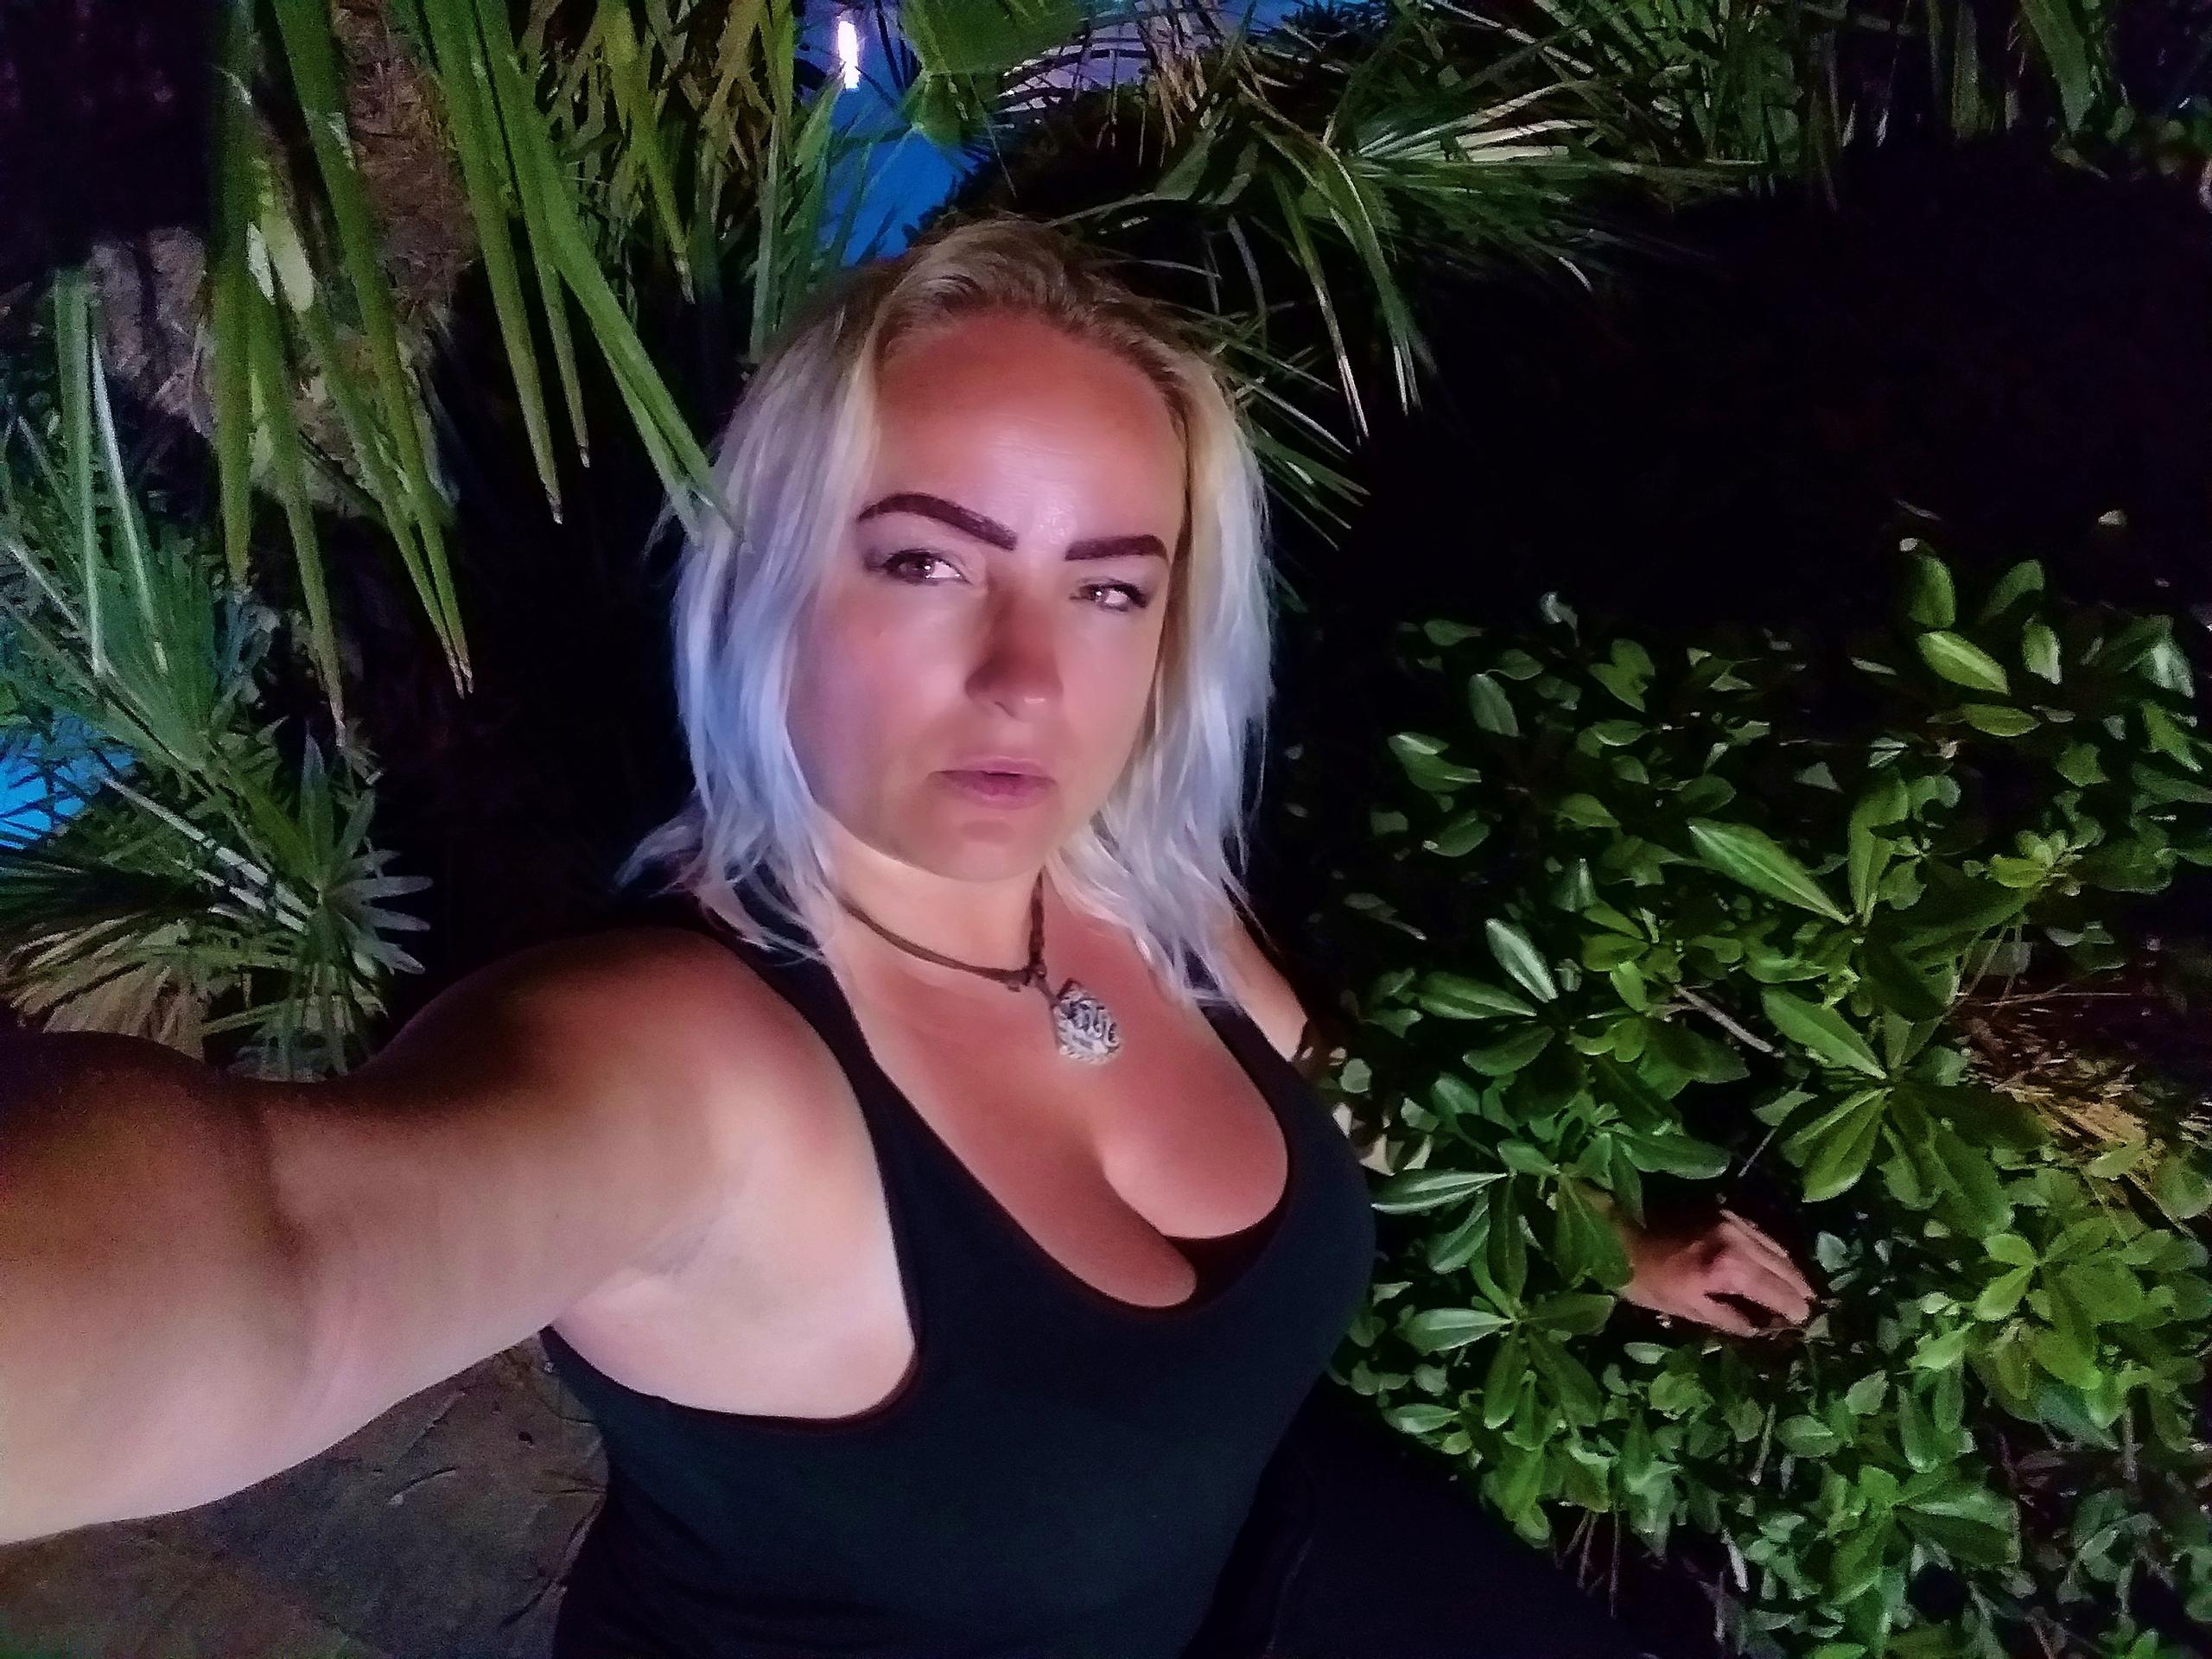 Елена Руденко ( Валтея). Мои путешествия. Турция. Мармарис. (фото ). 2cxhxxCMjjc